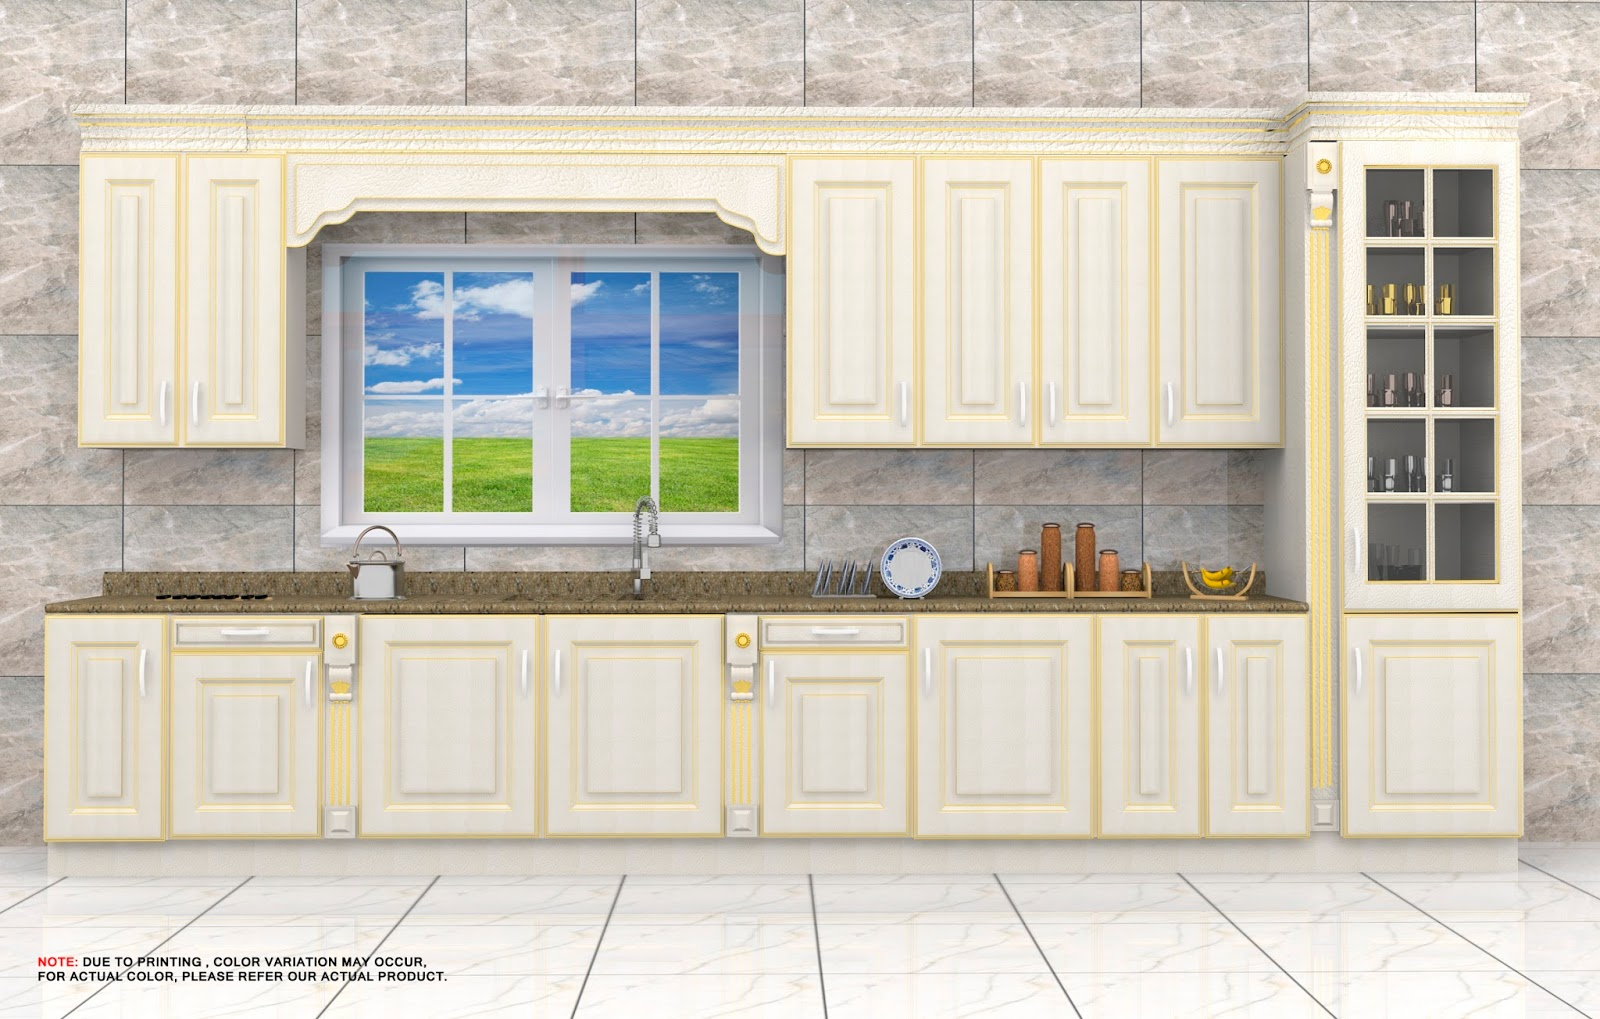 qdesignfactory: classic golden and crack kitchen design